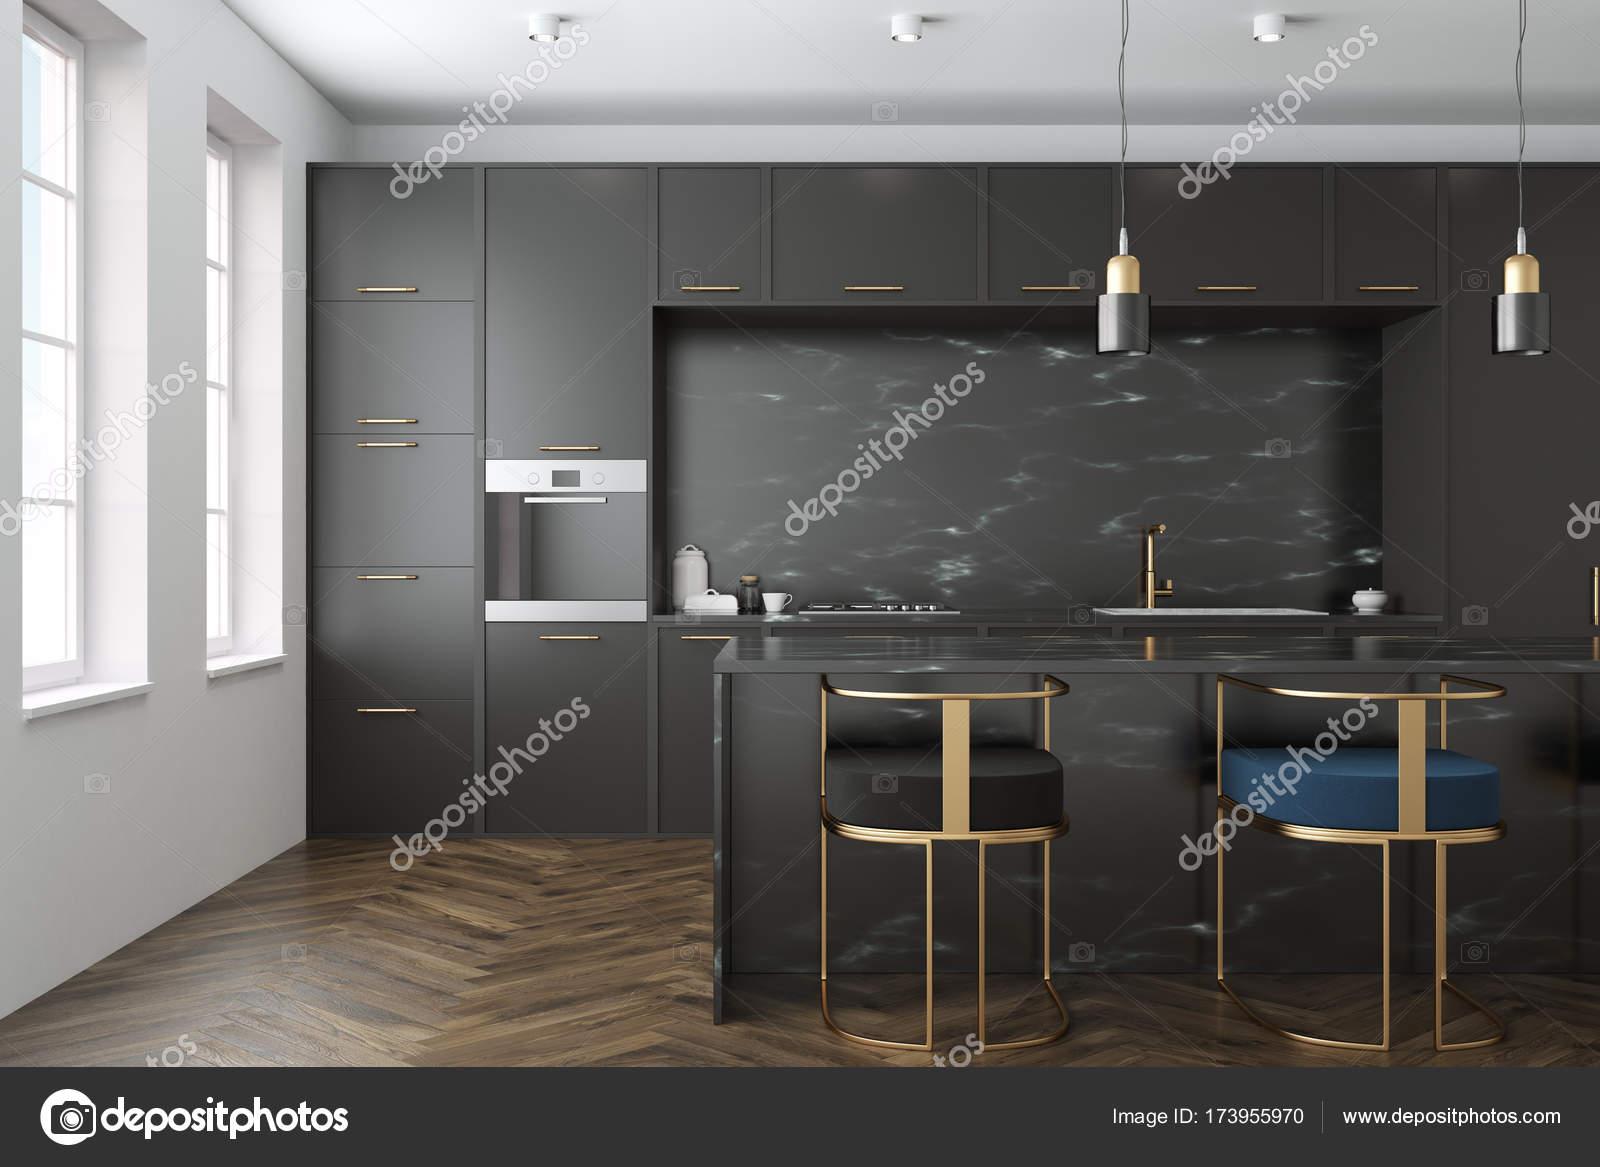 Keuken Marmer Zwart : Zwarte marmeren keuken interieur u stockfoto denisismagilov